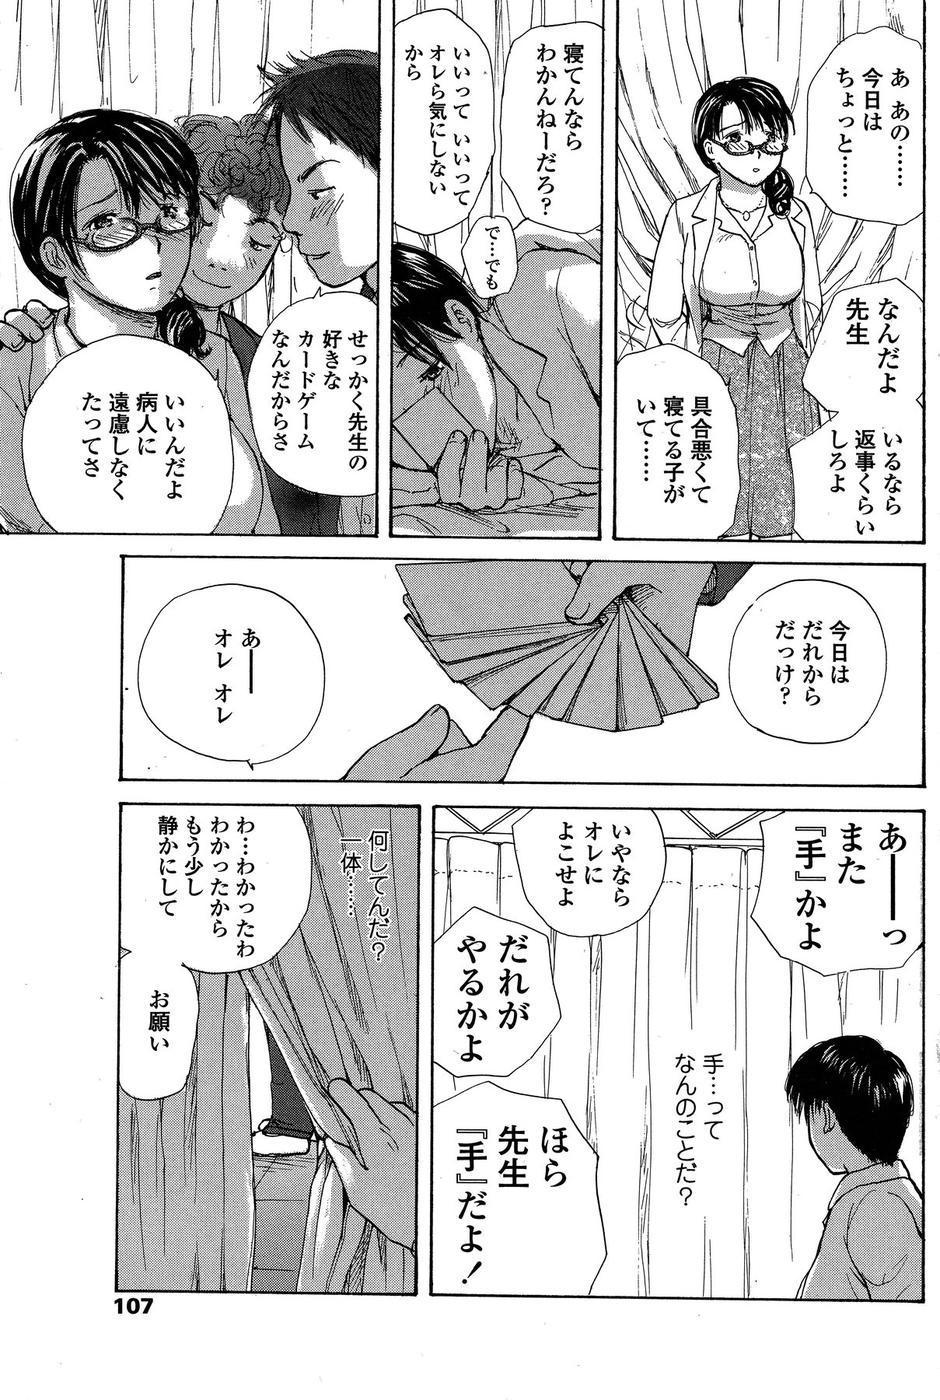 COMIC SIGMA 2009-01 Vol.28 39